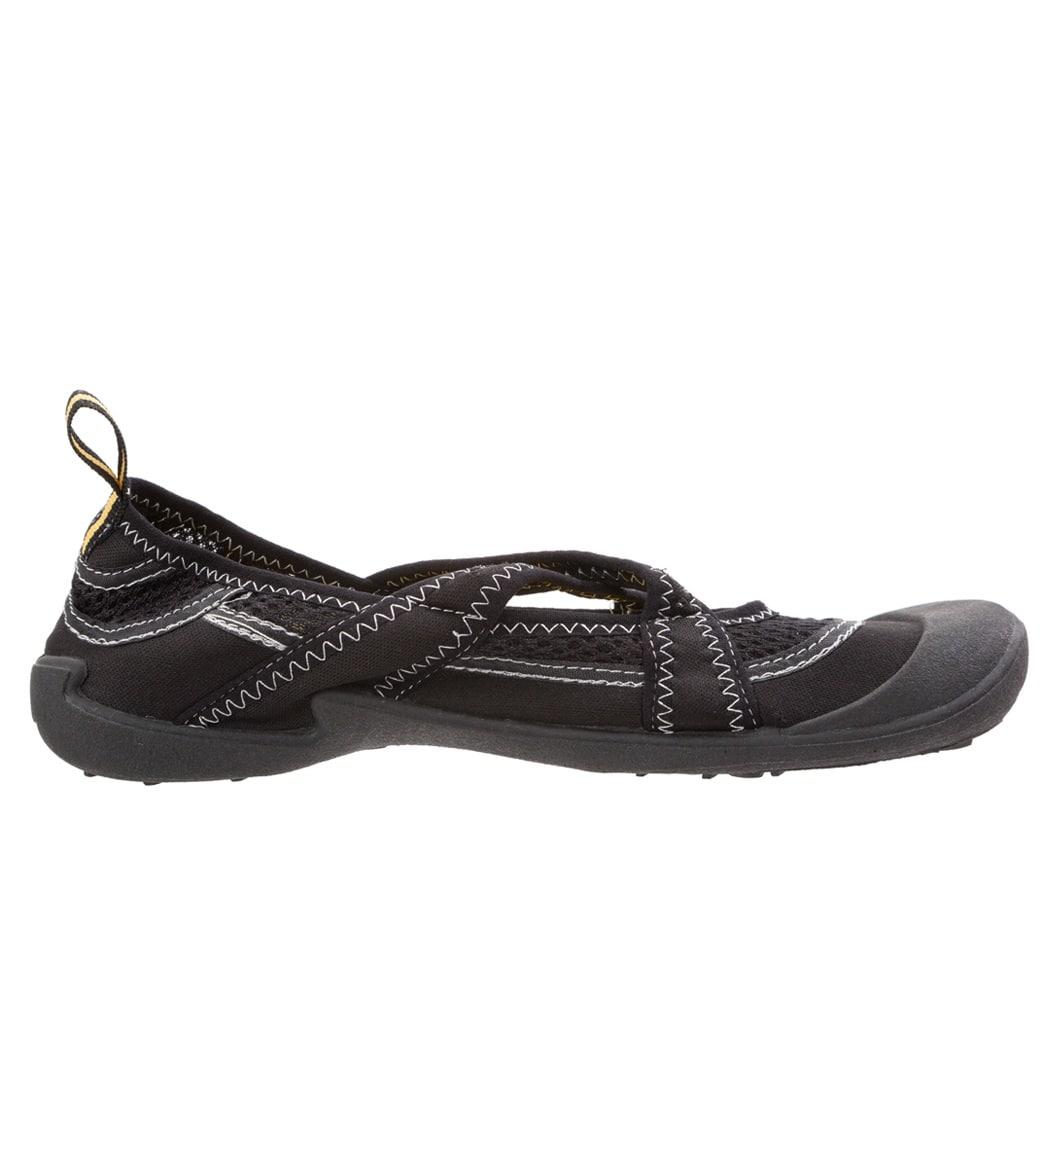 Cudas Women's Shasta Water Shoes at SwimOutlet.com